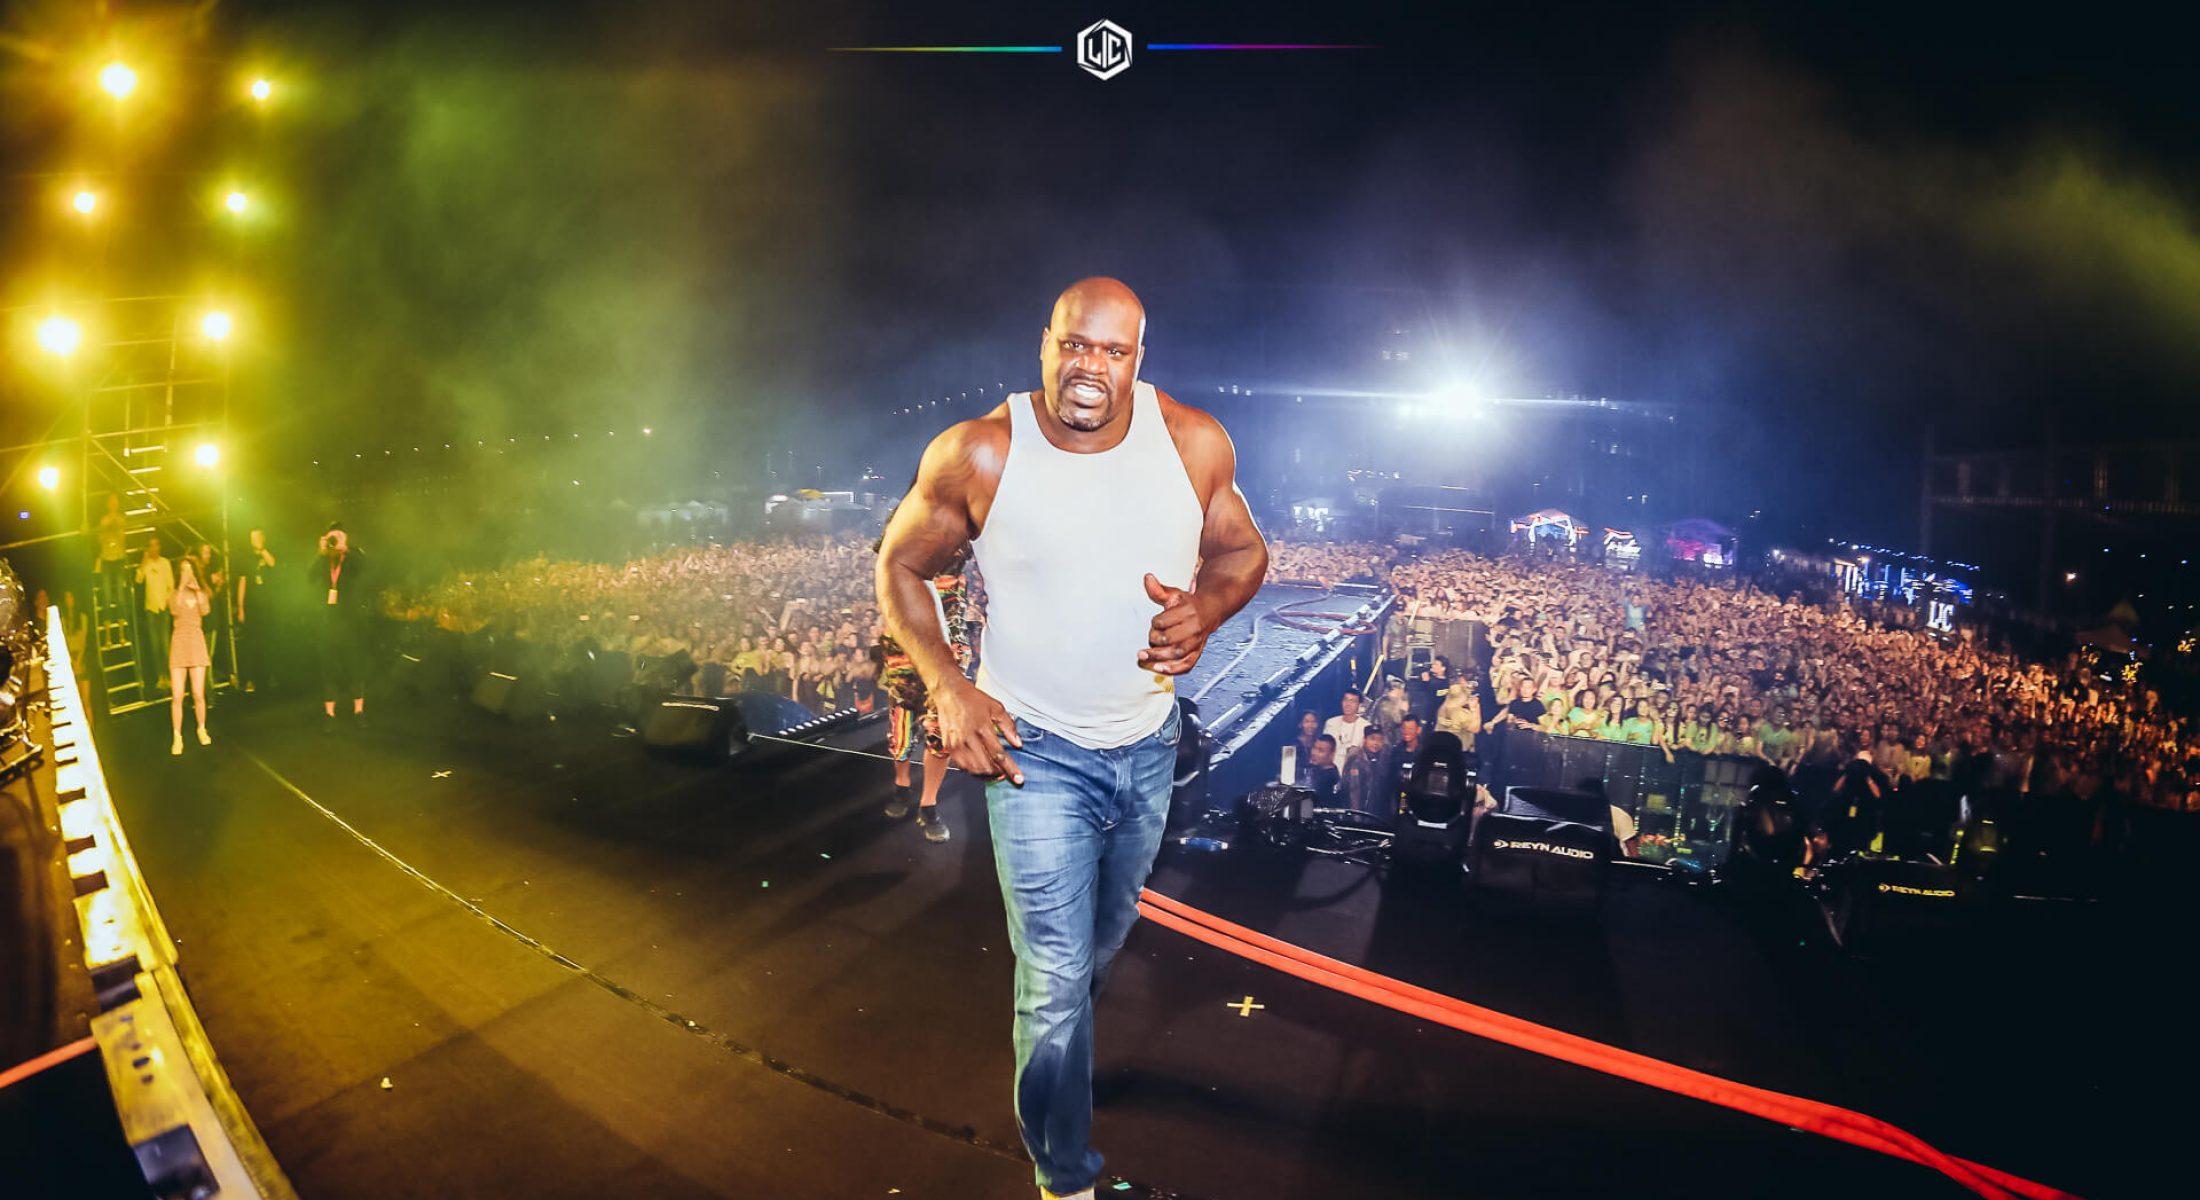 DJ DIESEL - Virgo Music Mgmt